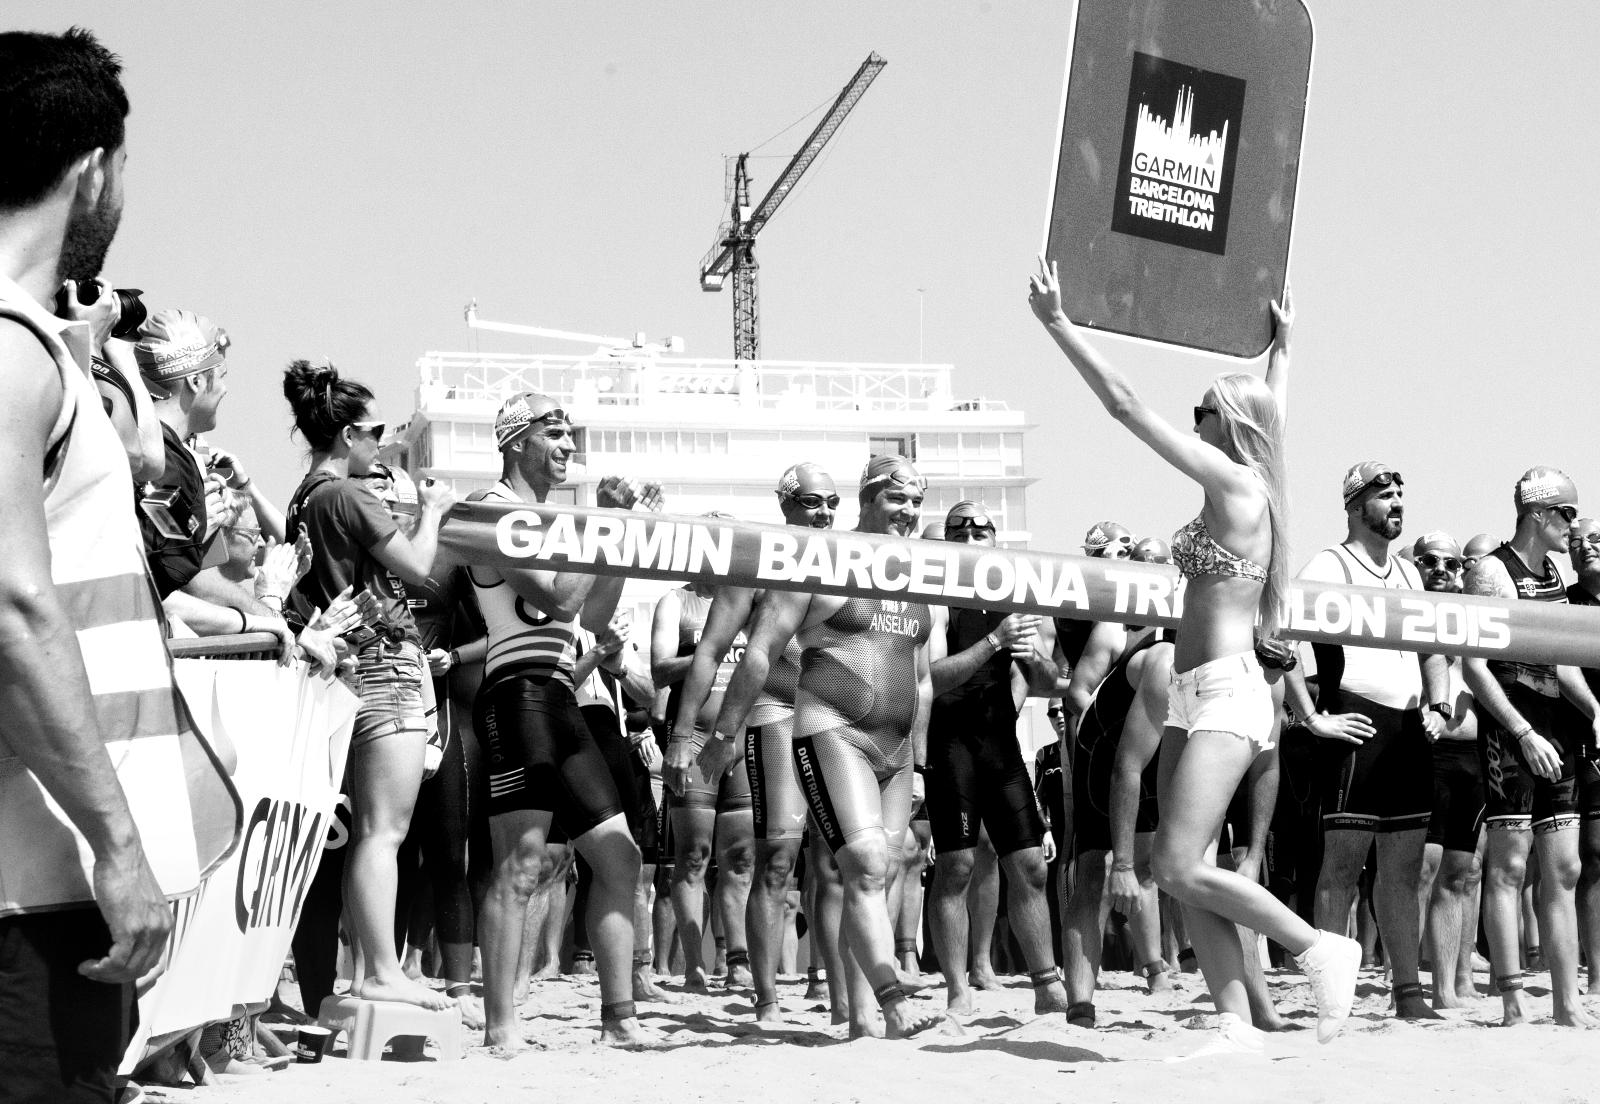 Garmin Barcelona - Documentary - by Rob Adalierd